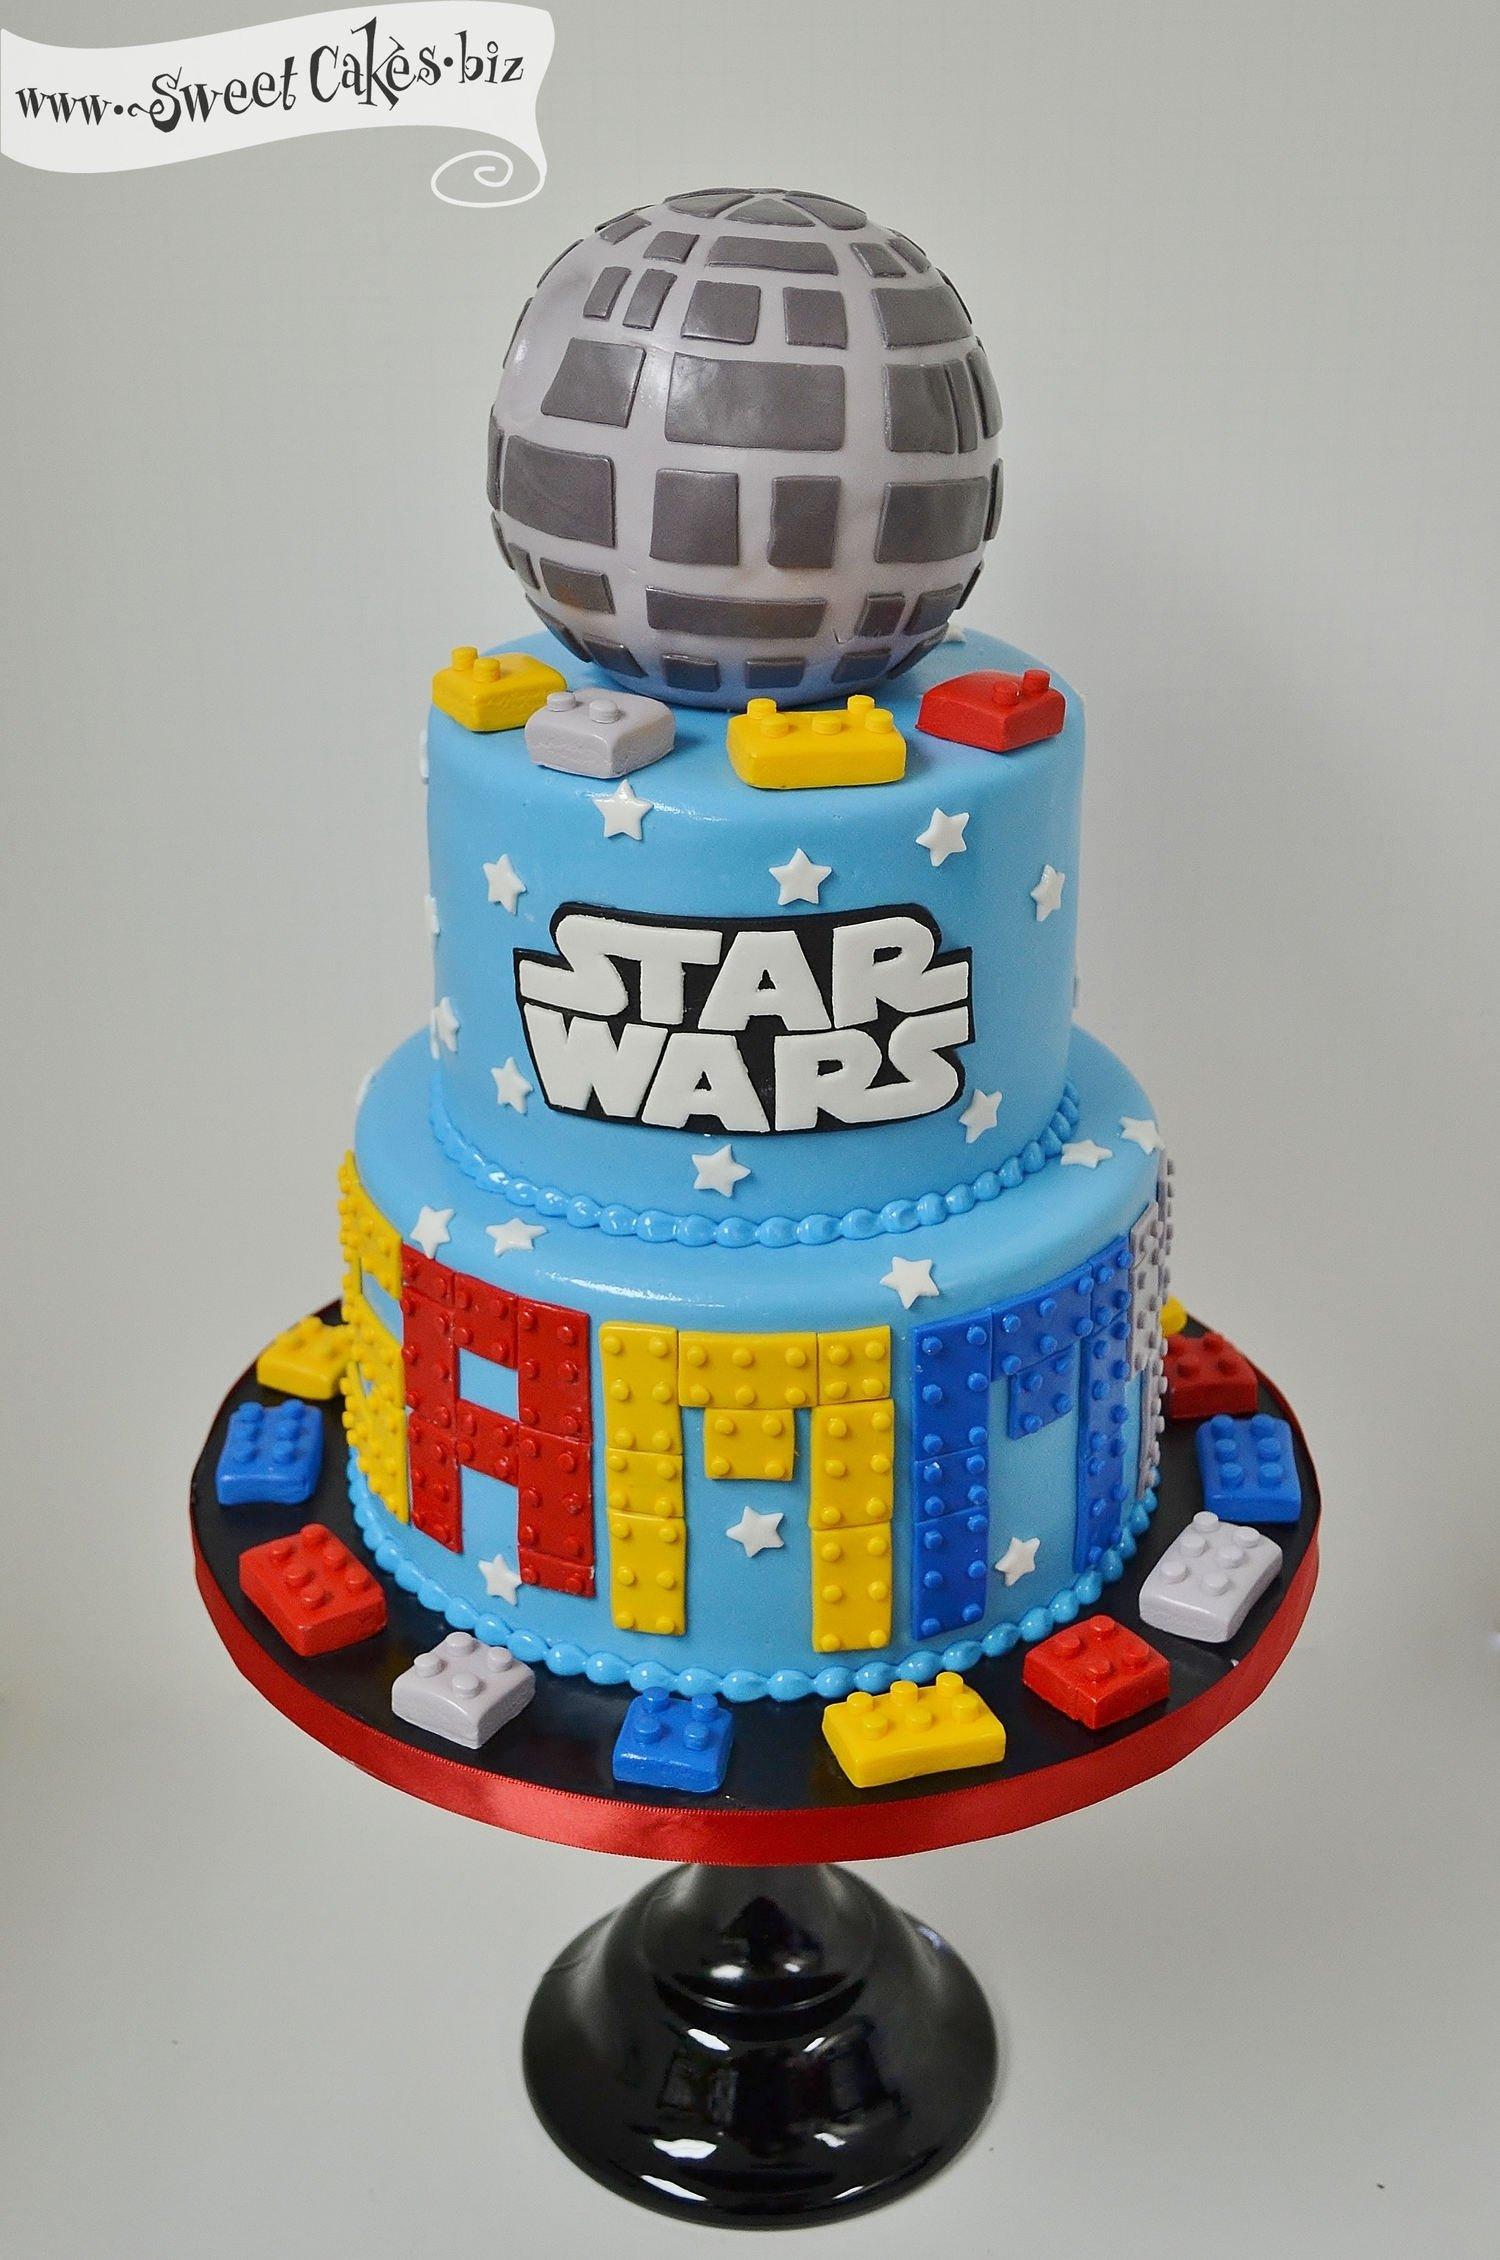 10 Fantastic Lego Star Wars Birthday Party Ideas love this cake for skylars 7th birthday lego star wars birthday 1 2021